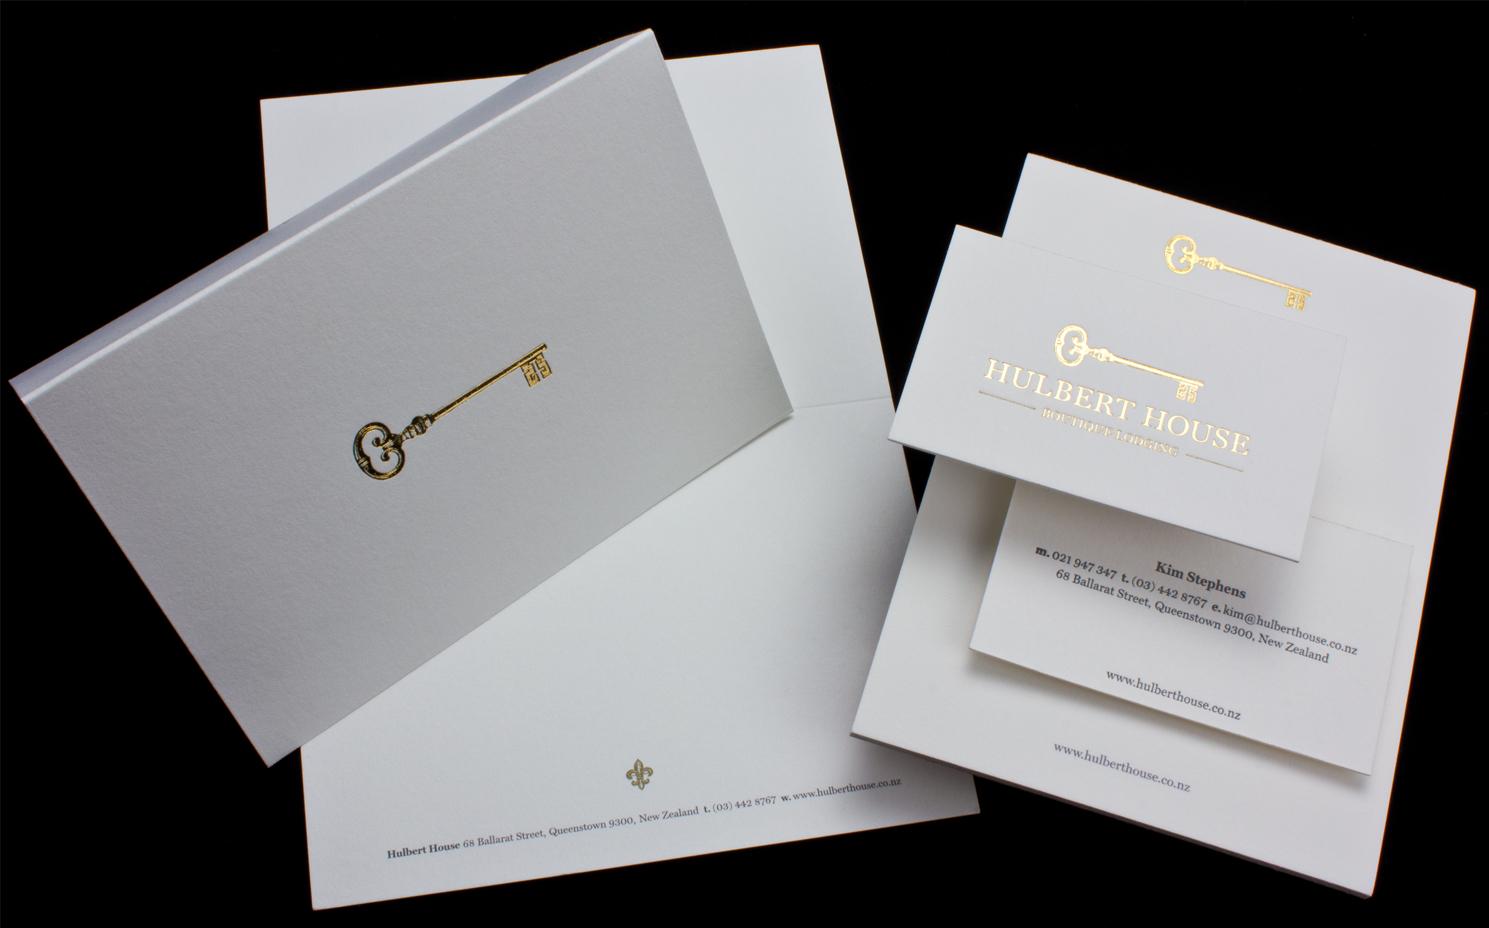 Logick print nz trade enterprise better by design covers reheart Gallery